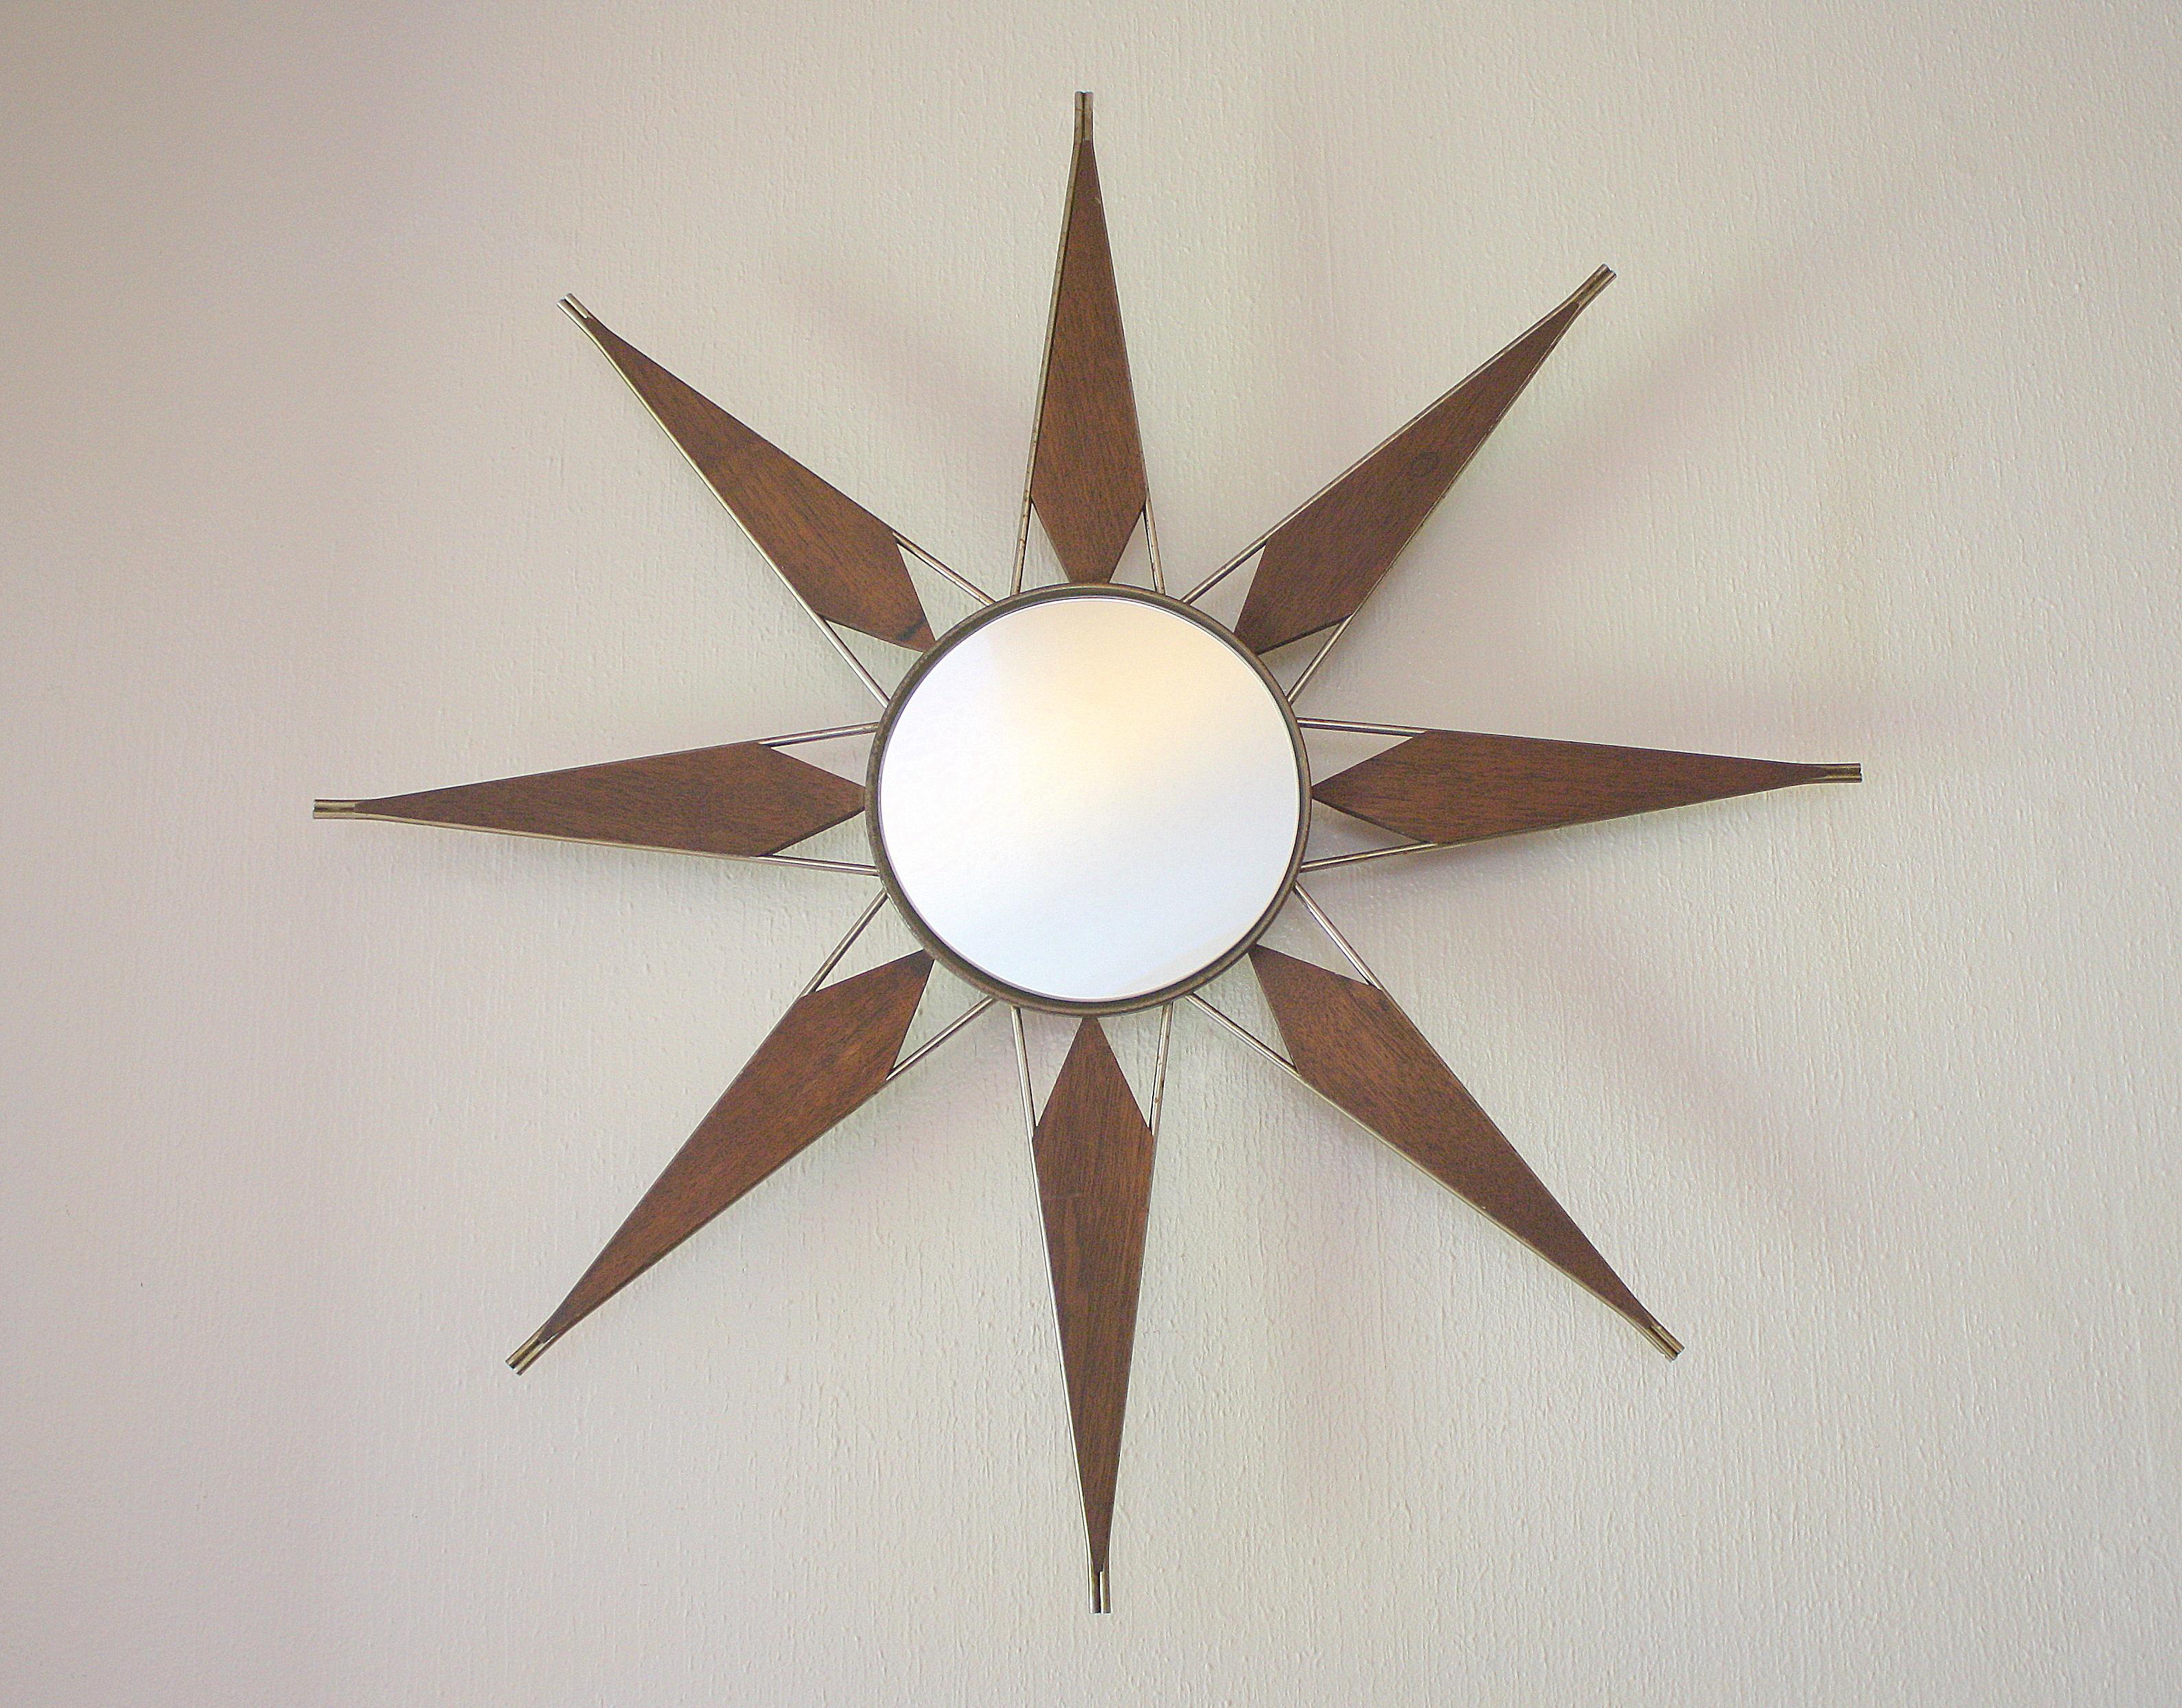 Mid Century Modern Sunburst Mirror Picked Vintage : mcm starburst mirror 1 from pickedvintage.com size 3176 x 2486 jpeg 6012kB